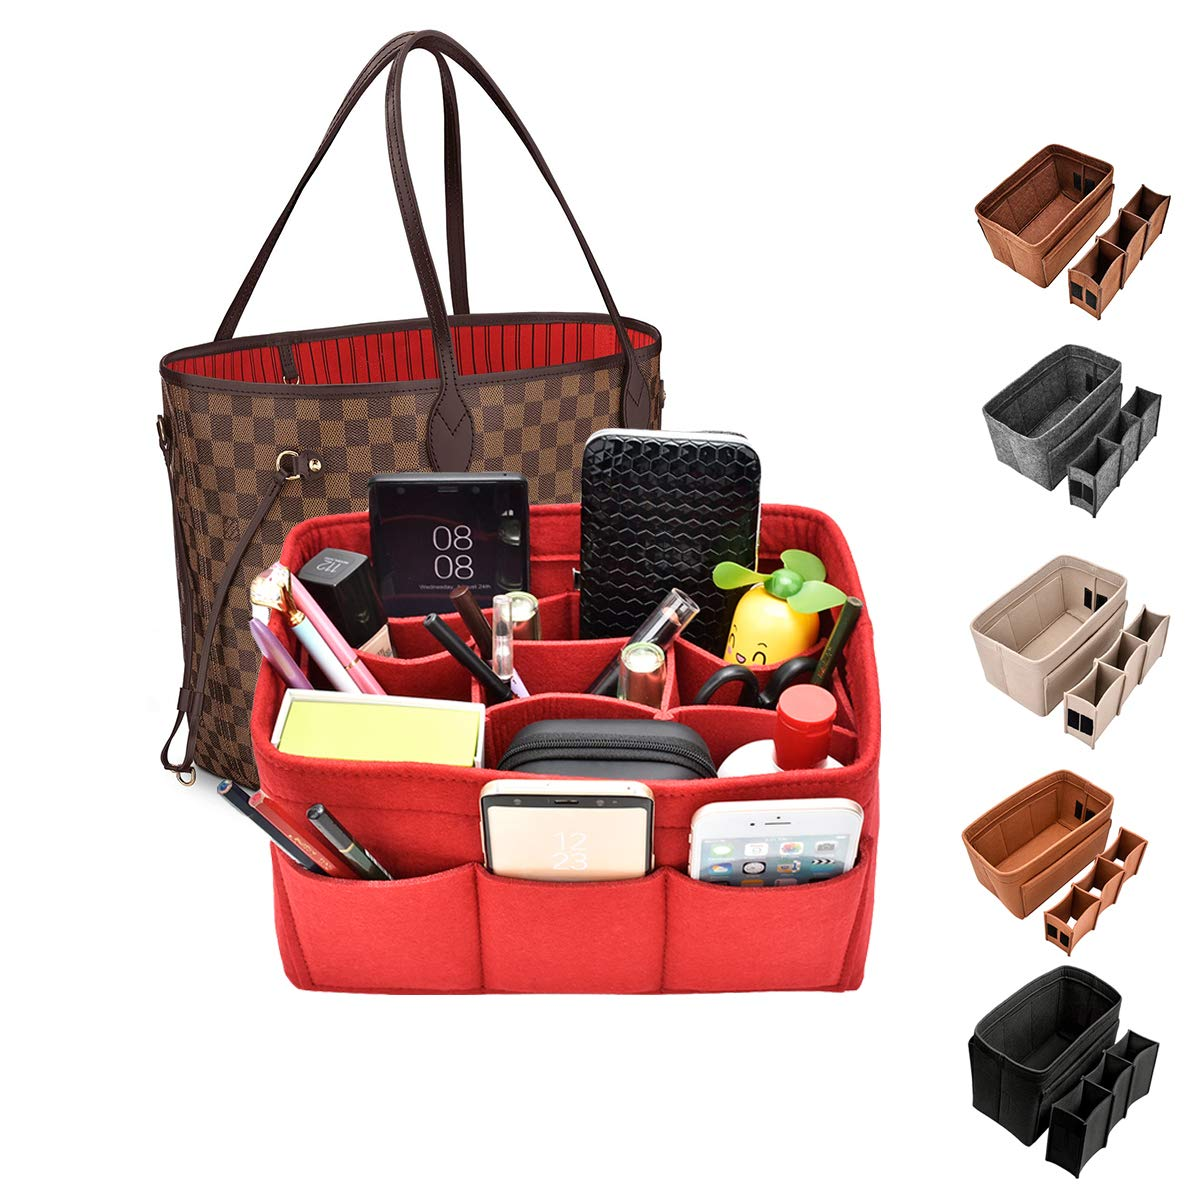 Kumako Bag Organizer,Felt Purse Insert Handbag Organizer For LV neverful,Speedy&Tote Bag (M, Red)